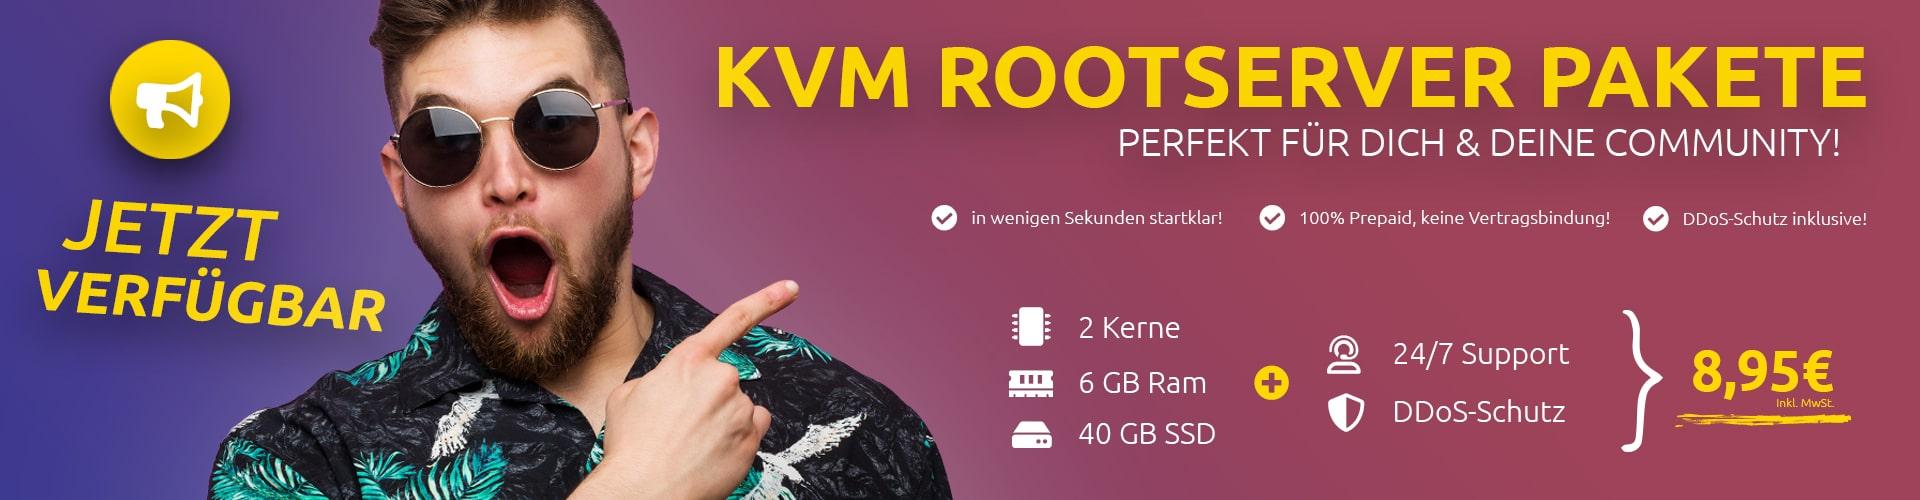 Günstige Prepaid SSD KVM Rootserver Pakete ab 4,95€ pro Monat